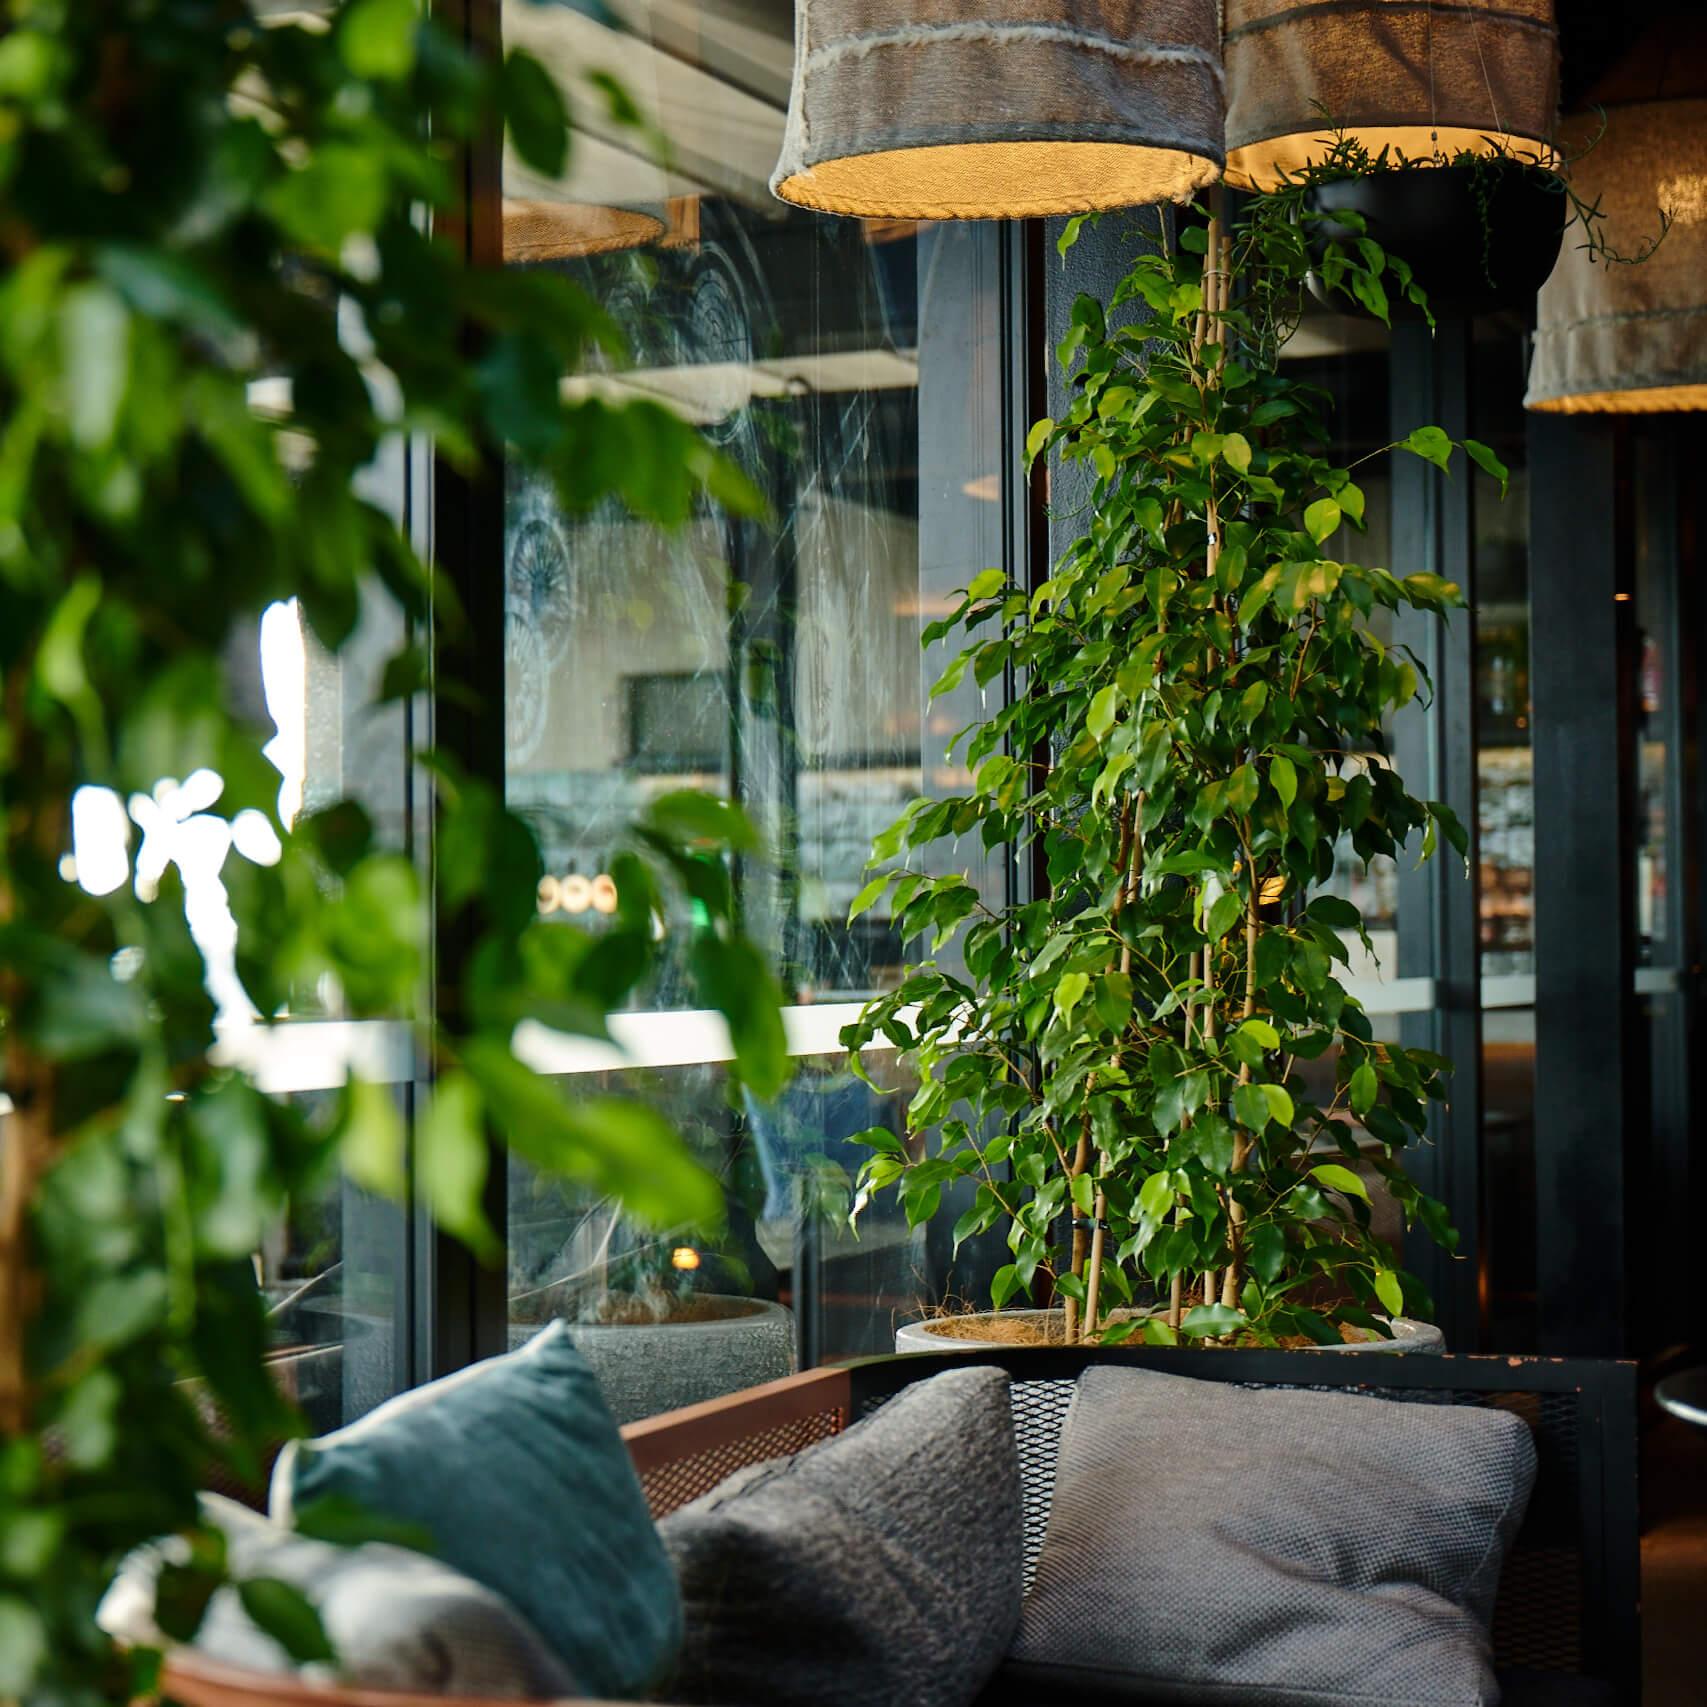 portfolio-hotels-and-apartments-qthotel-image8